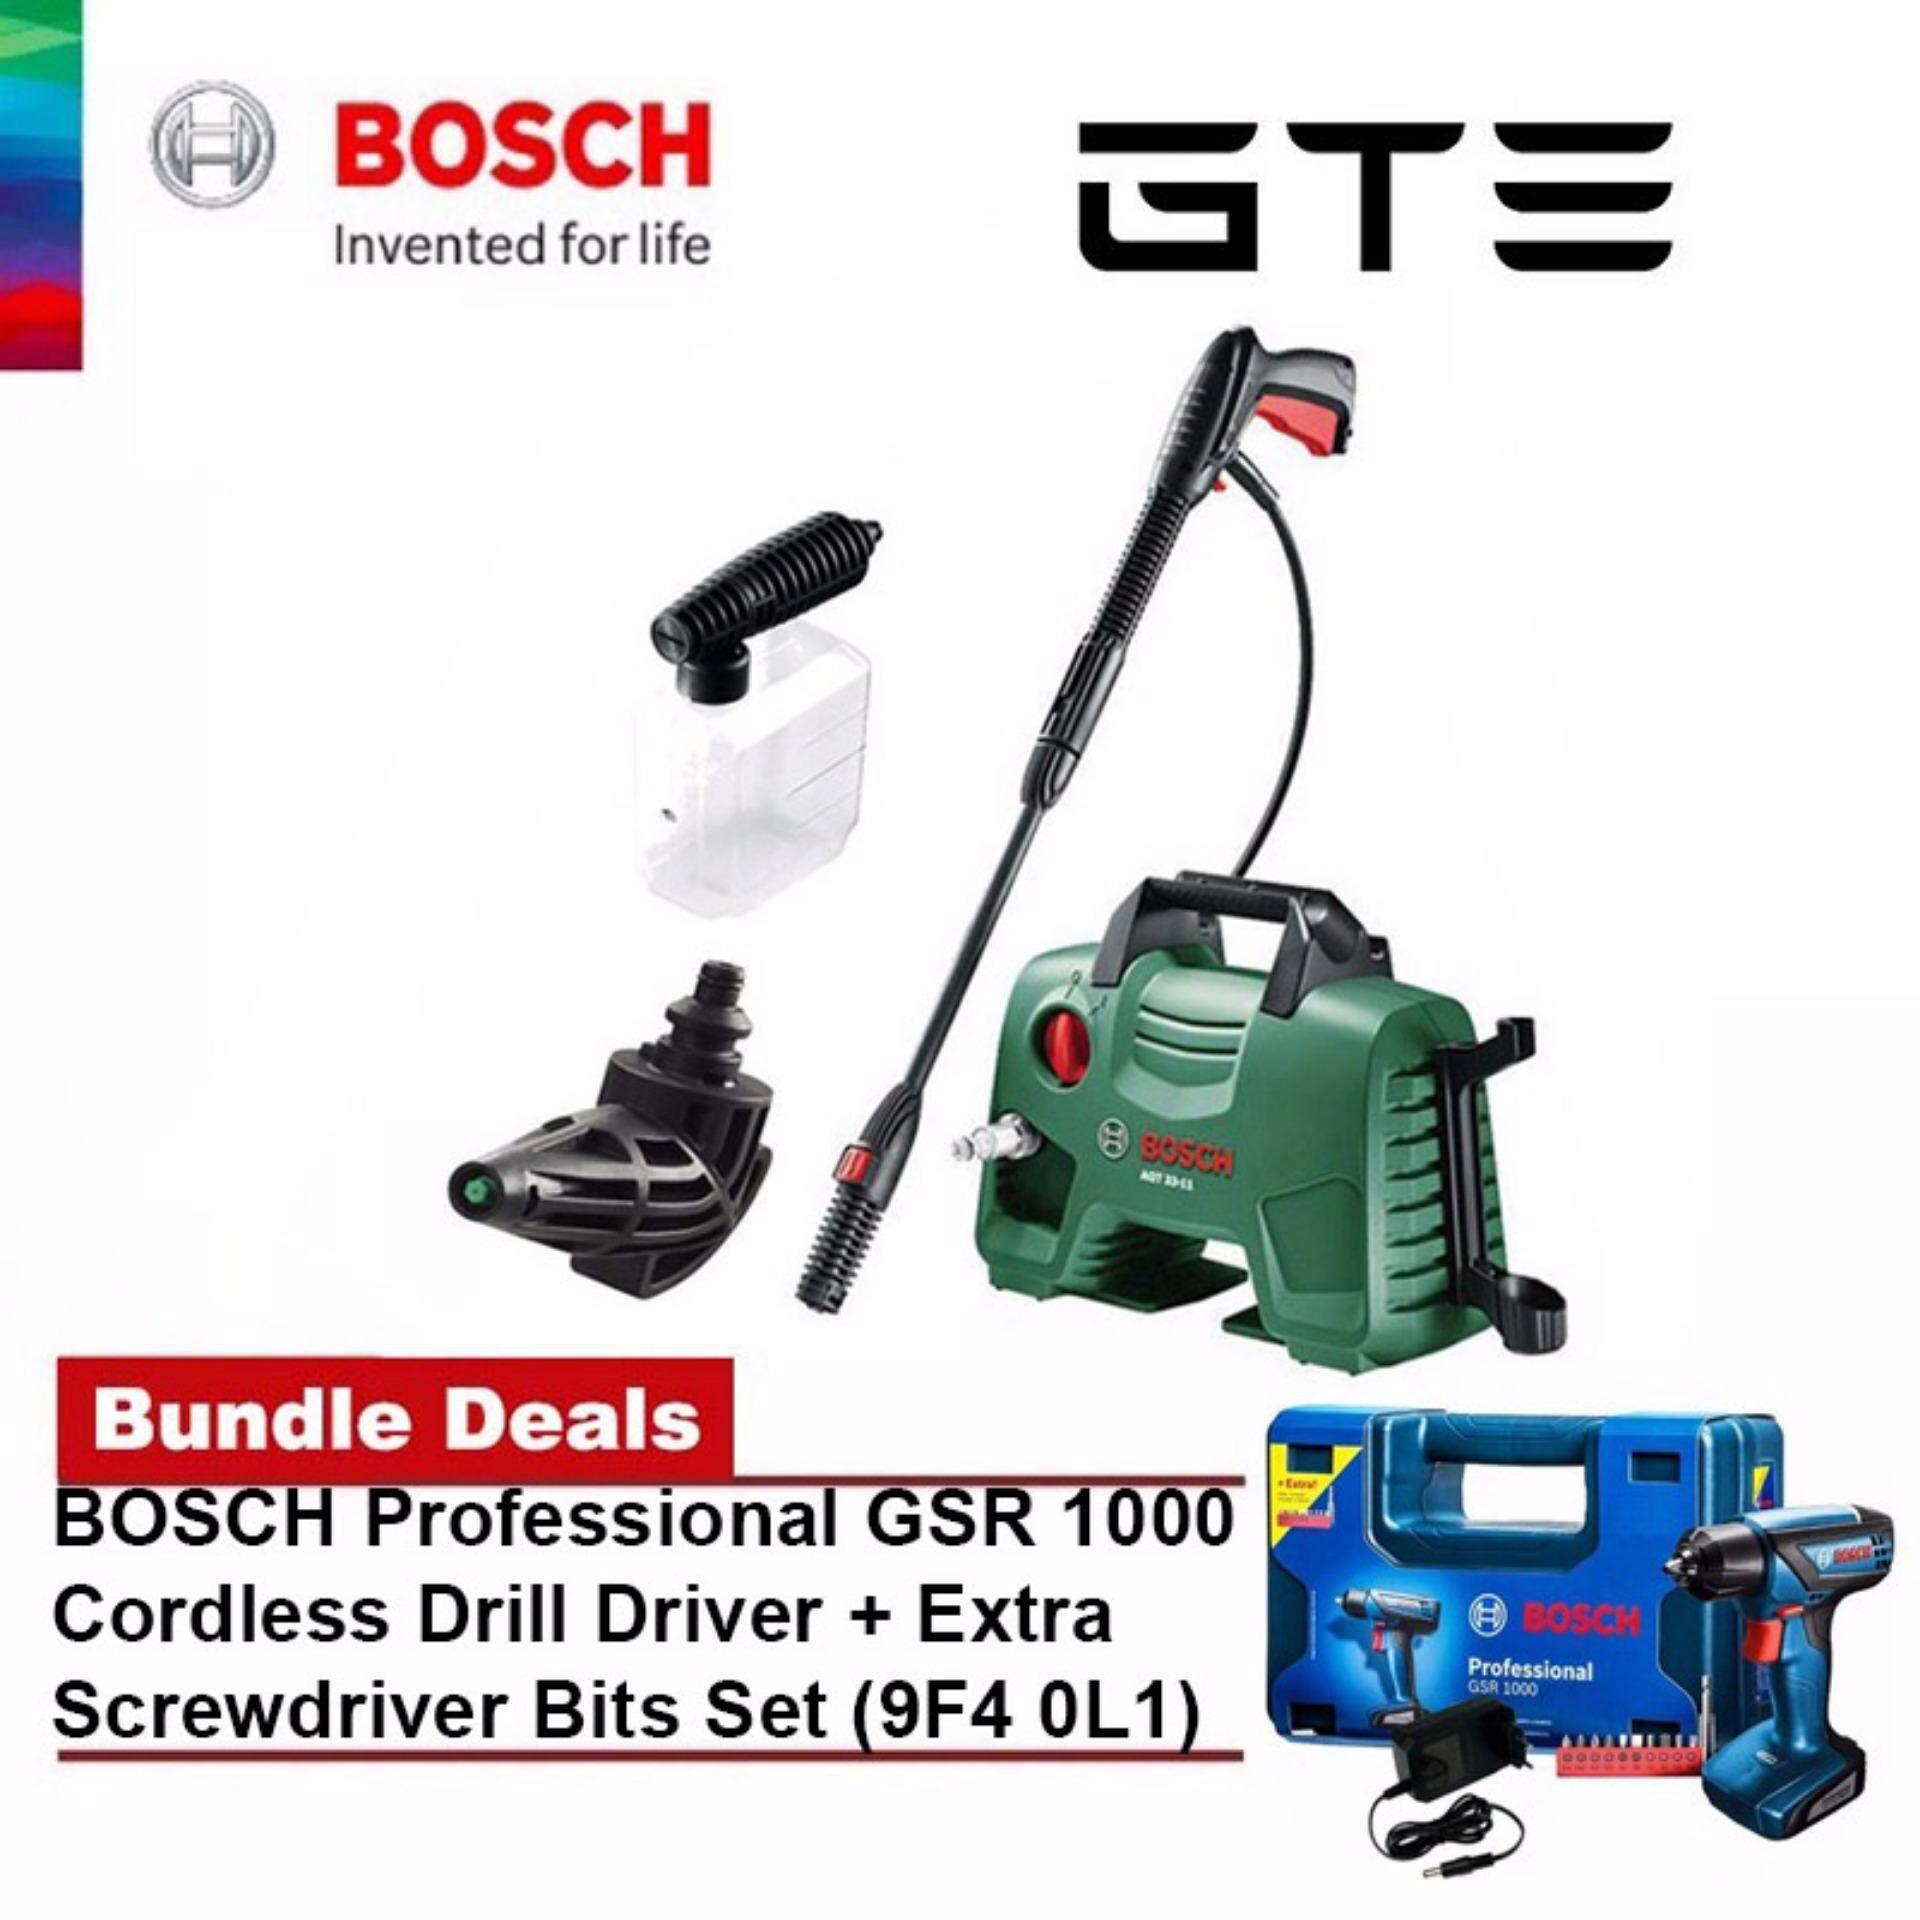 Buy Bundle Deal Bosch Aqt 33 11 Aquatak High Pressure Cleaner Washer Aqt33 1300w Professional Gsr